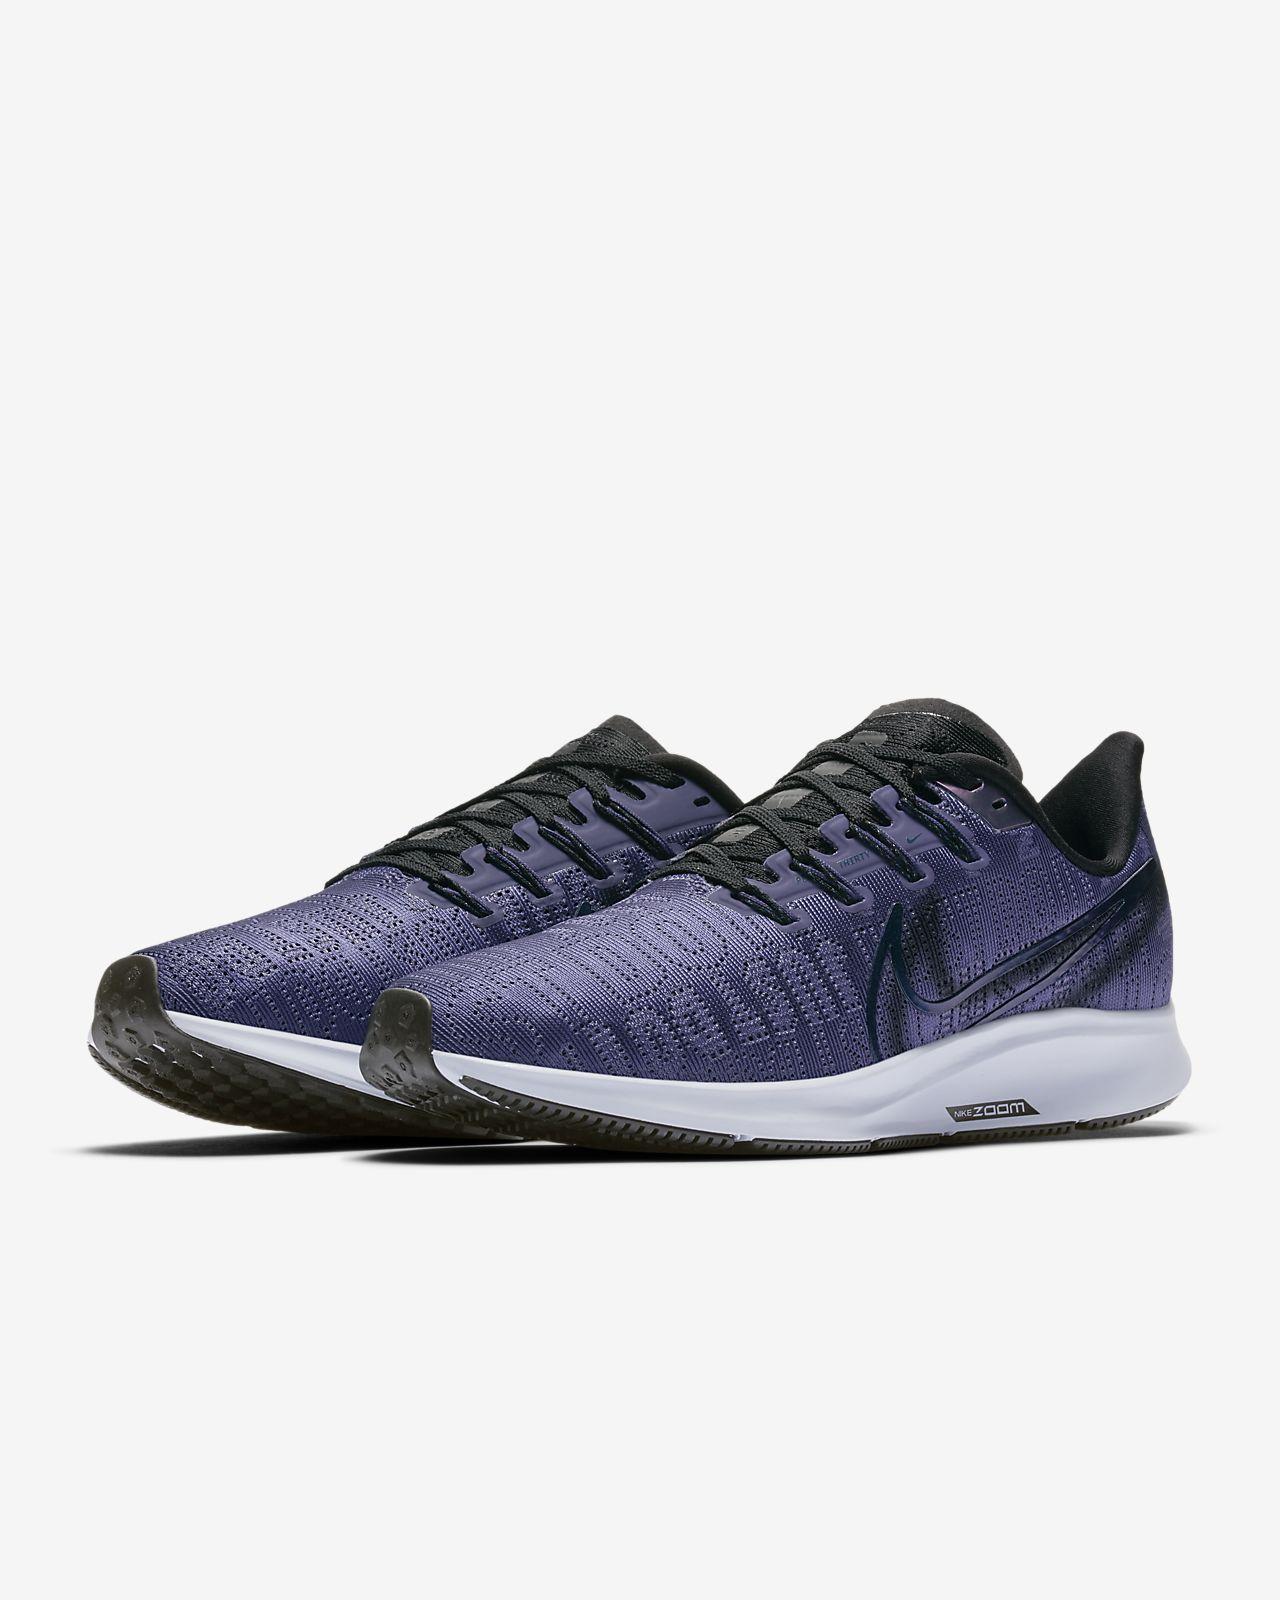 Riduzione delle vendite Nike Air Huarache Run Premium